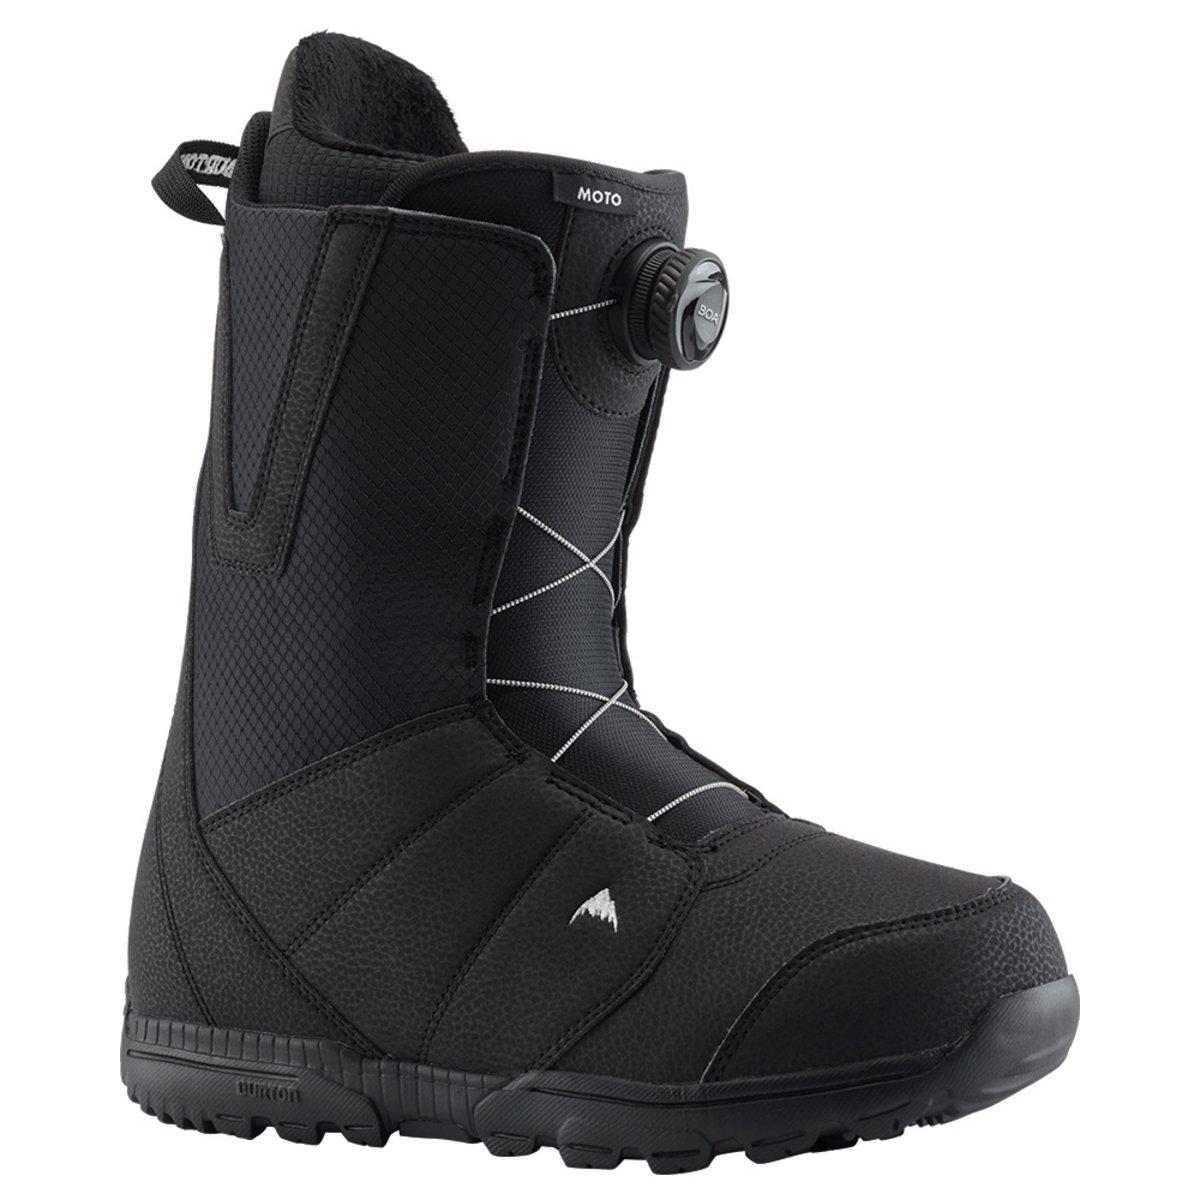 Burton Men's Moto Boa Snowboard Boots 2019 / 2020 0